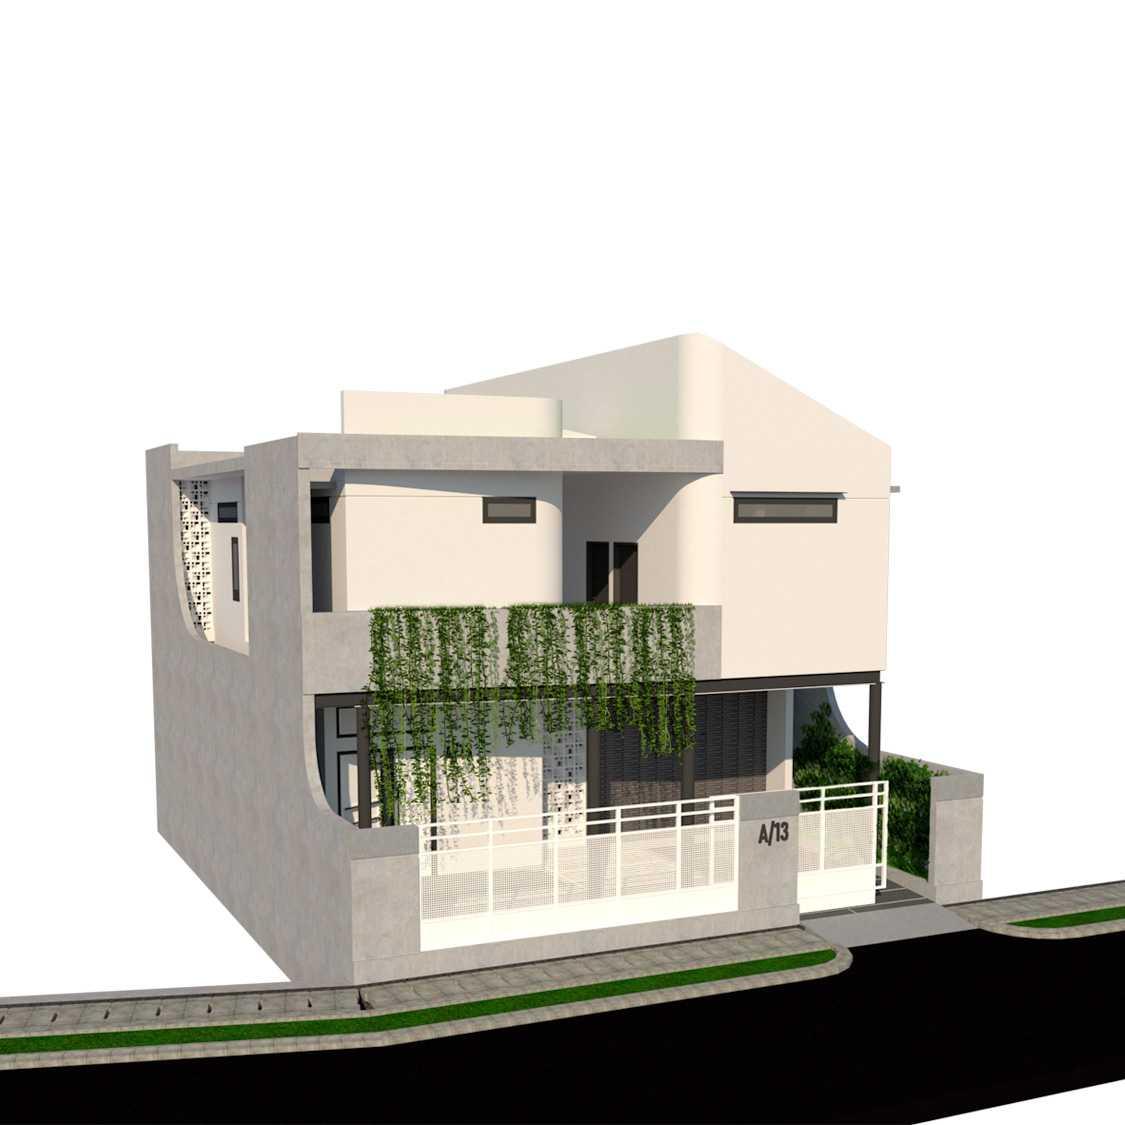 Inawa Arsitek Simple Boarding House Makassar, Kota Makassar, Sulawesi Selatan, Indonesia Makassar, Kota Makassar, Sulawesi Selatan, Indonesia Nasri-Architect-Associate-Simple-Boarding-House  90841